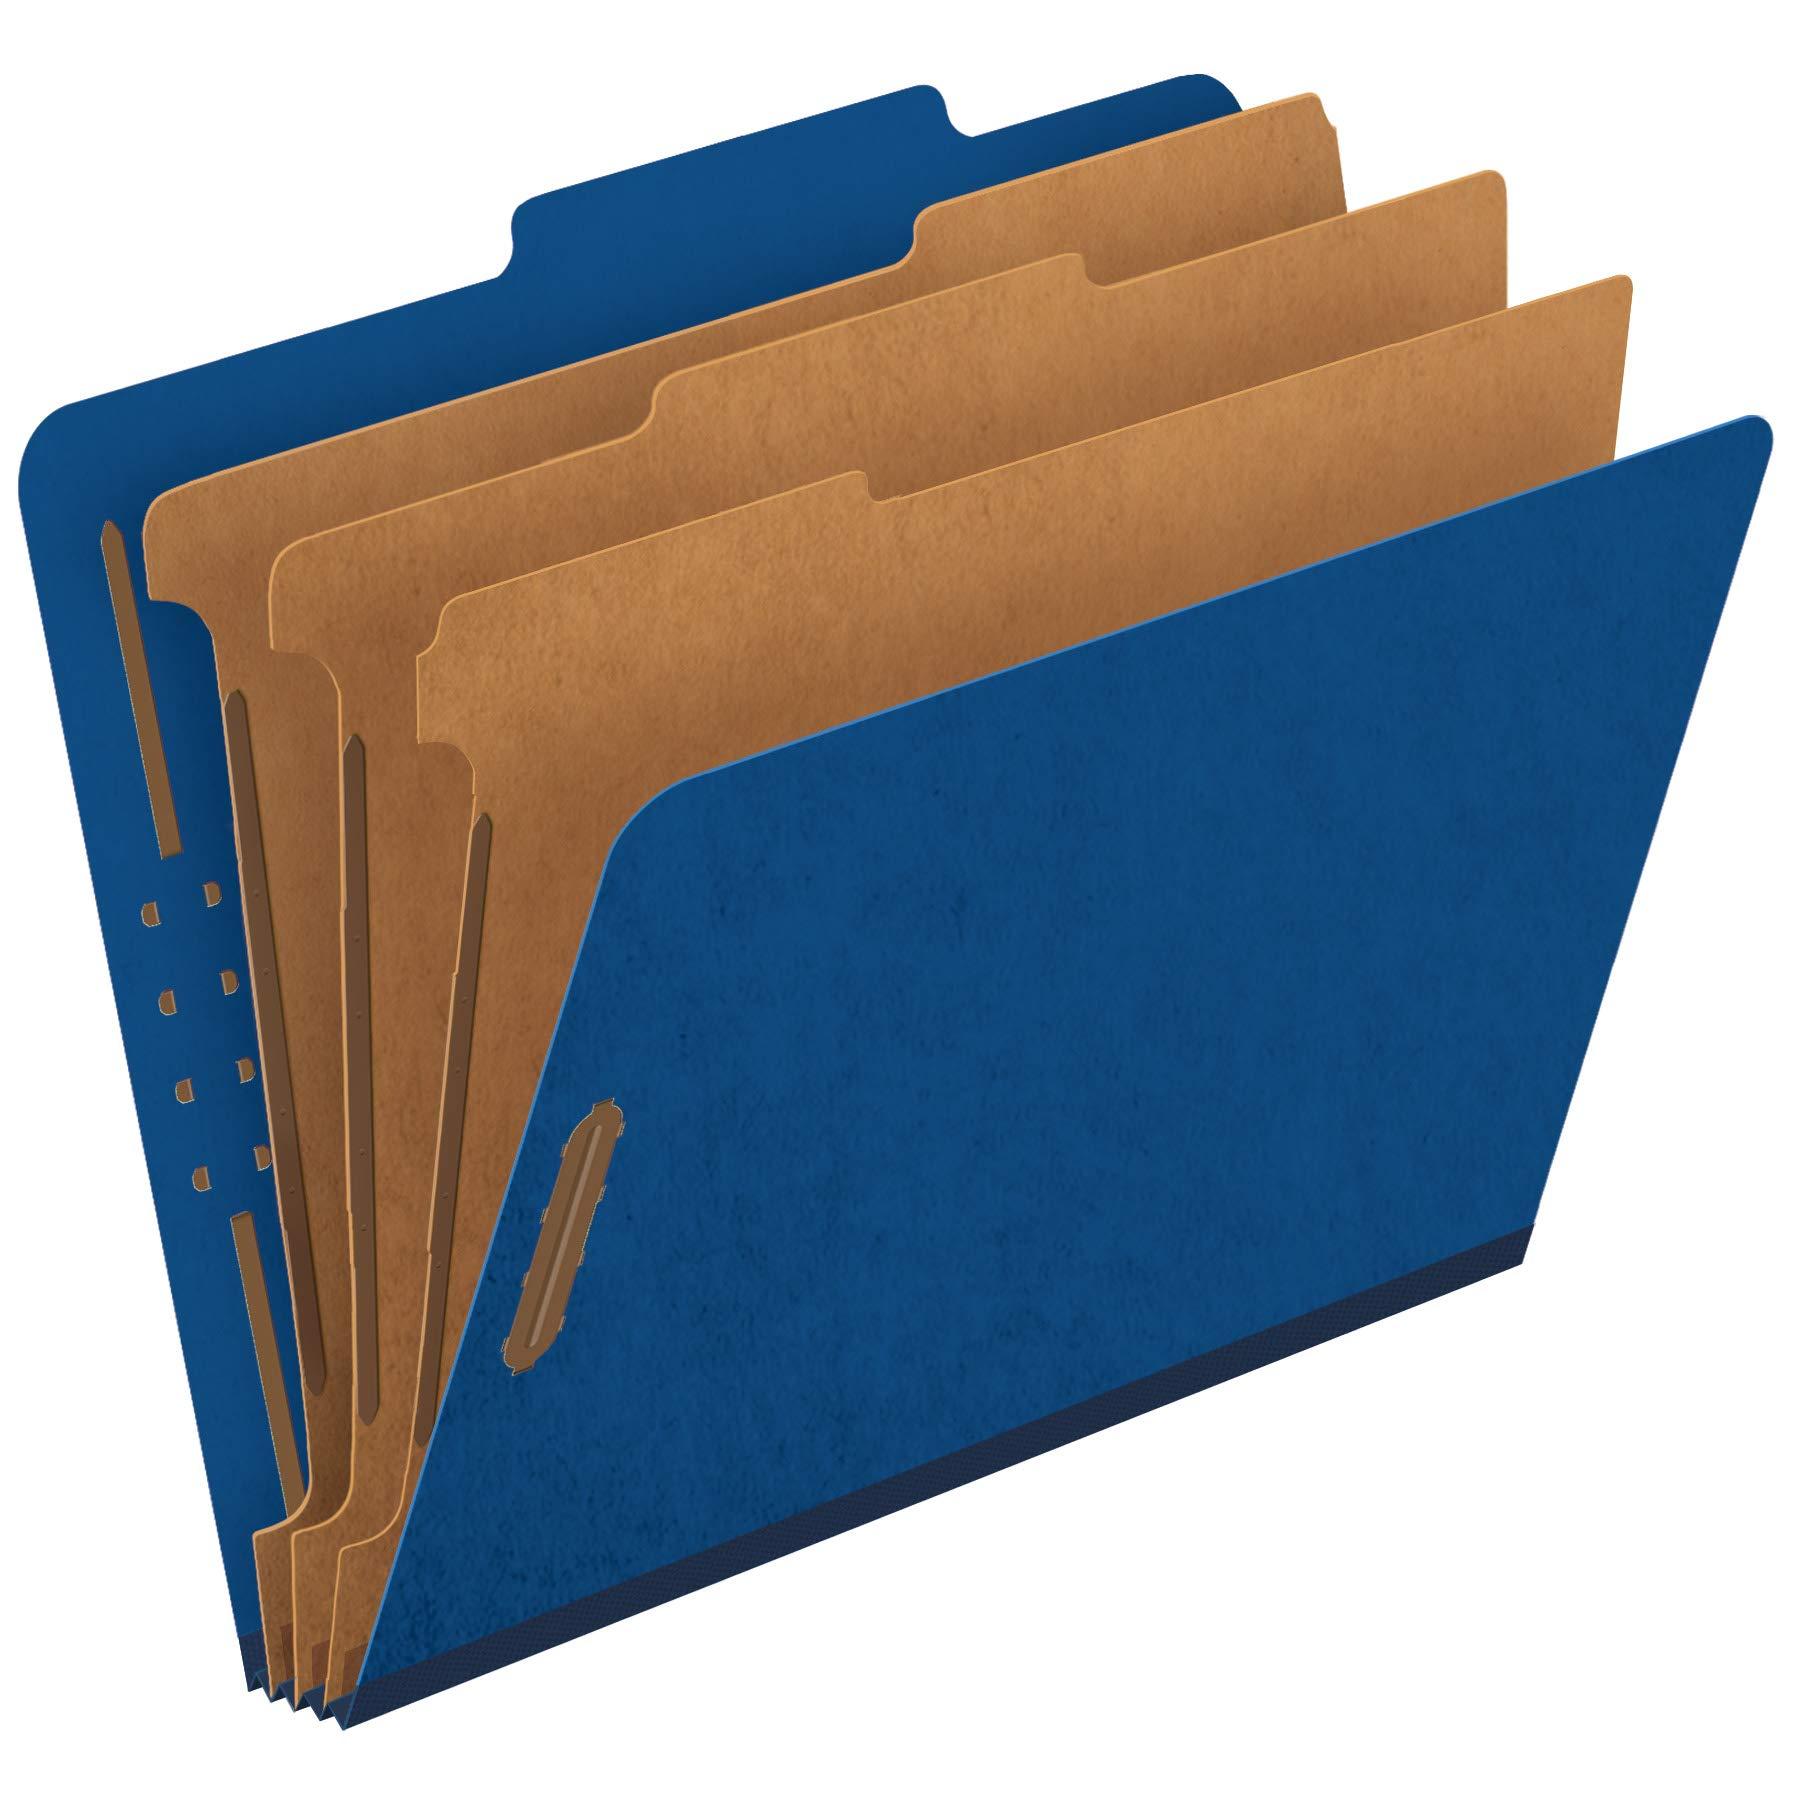 Pendaflex Classification Folders, Standard, 3 Dividers, Embedded Fasteners, 2/5 Cut Tab, Dark Blue, Letter, 10/BX (24096) by Globe Weis